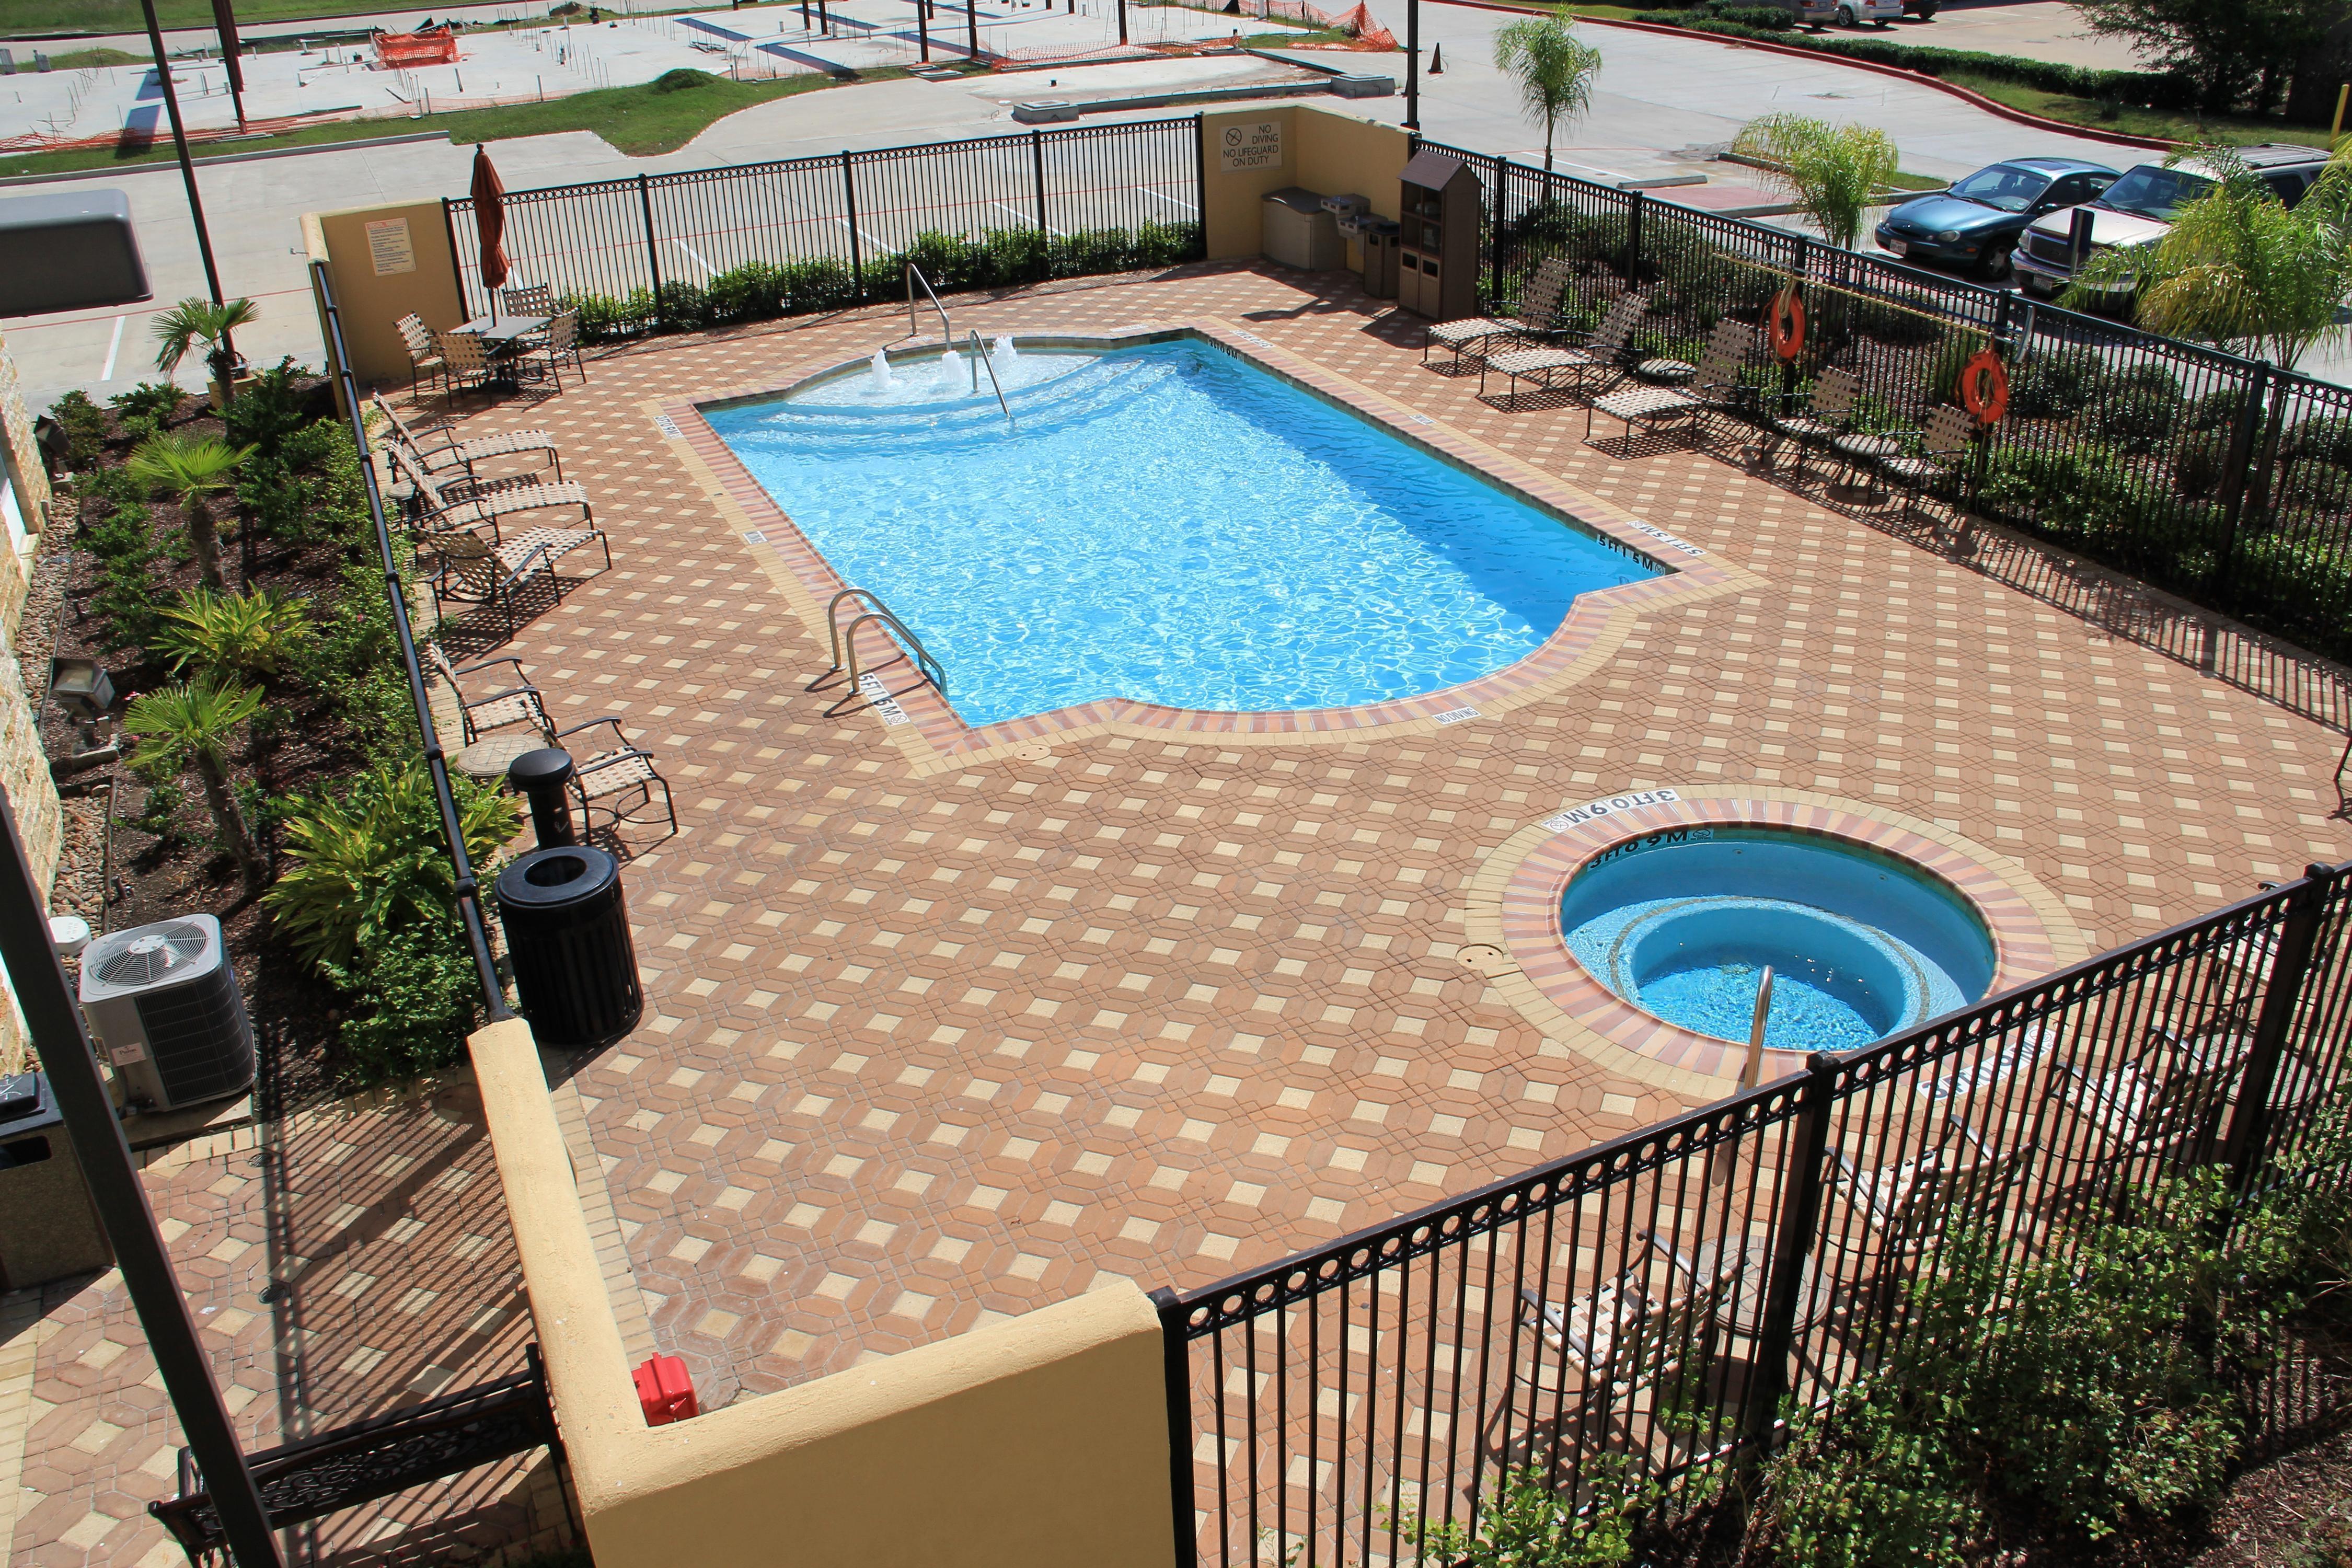 Hilton Garden Inn Houston West Katy In Katy Tx 77494